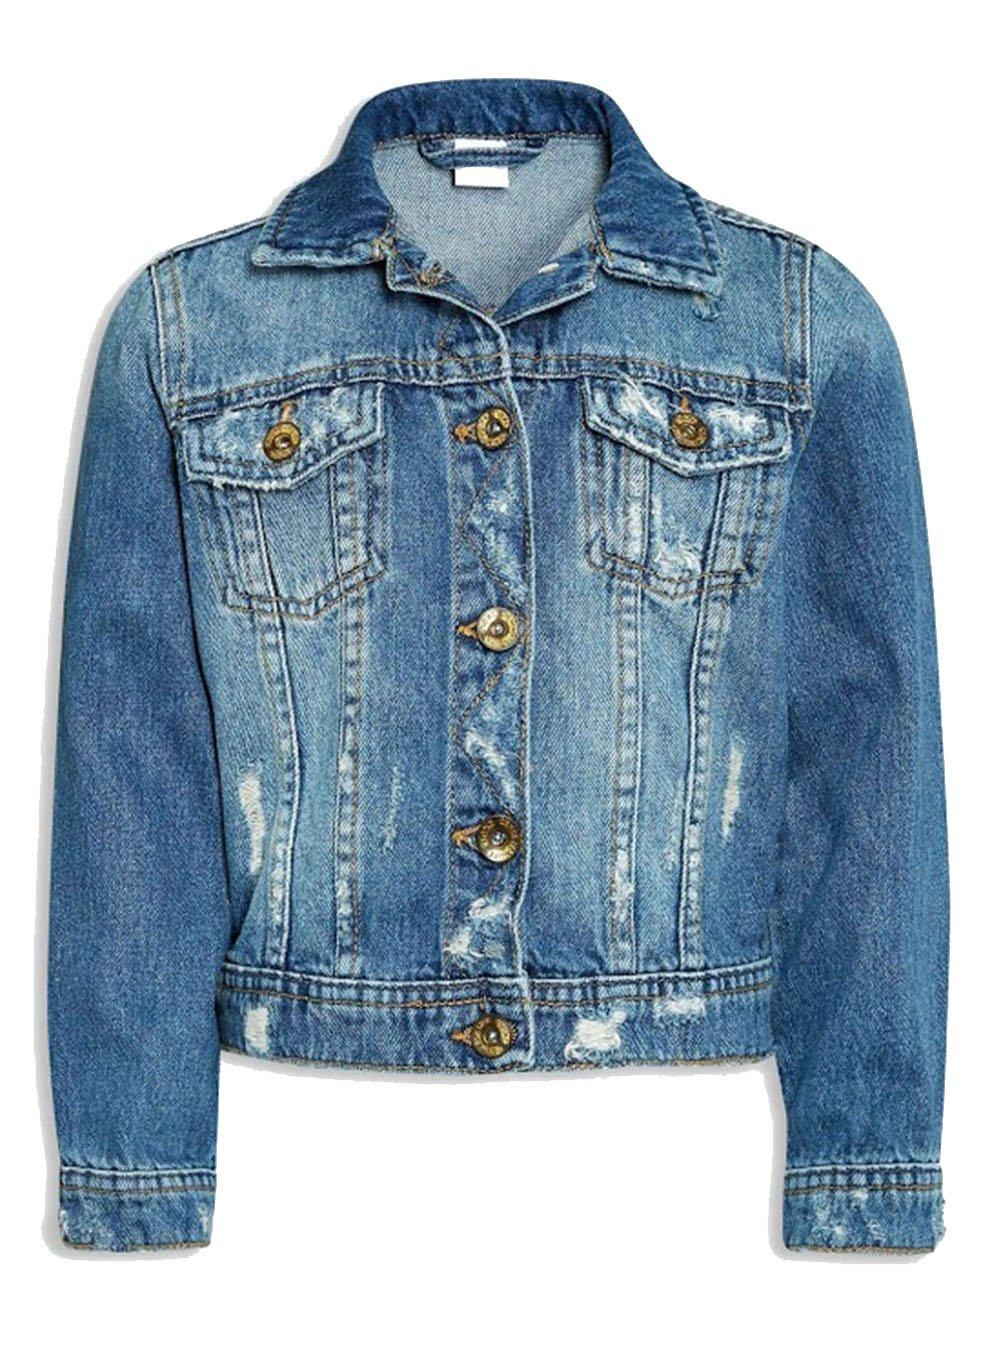 Khanomak Kids Girls Denim Distressed Button up Jacket (Size 5/6, MediumBlue)